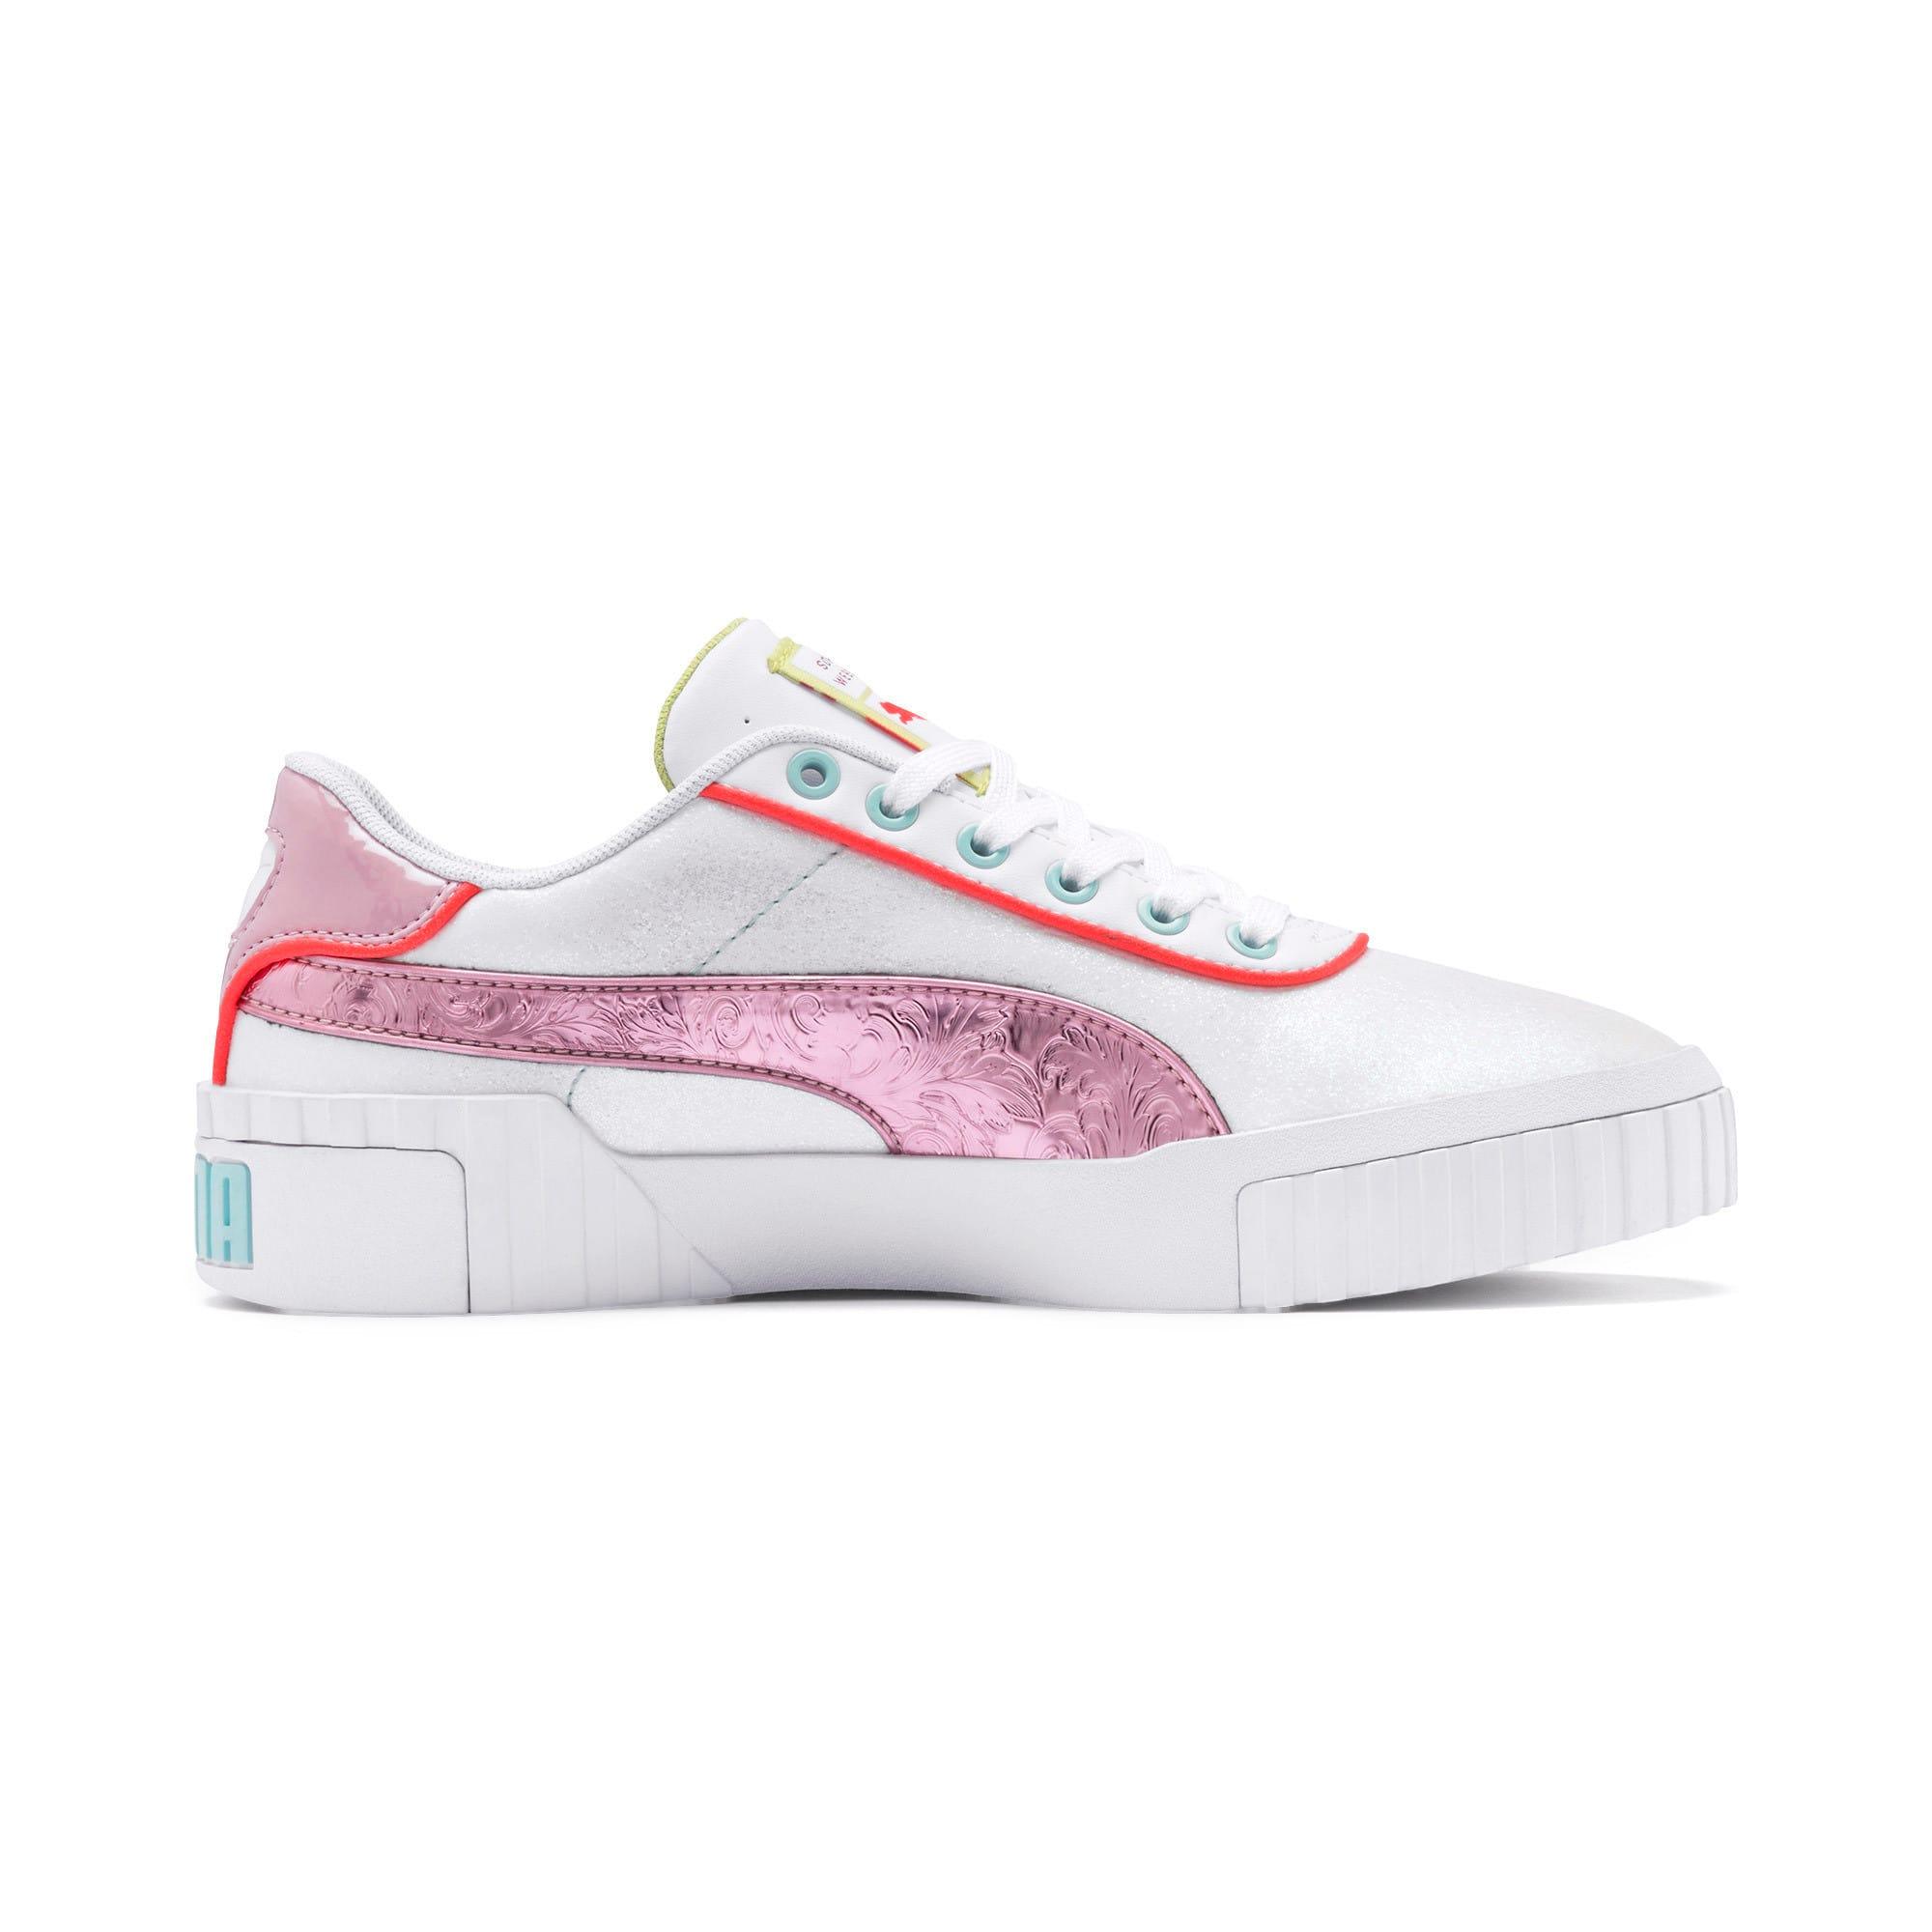 Thumbnail 5 of PUMA x SOPHIA WEBSTER Cali Women's Sneakers, Puma White-Pale Pink, medium